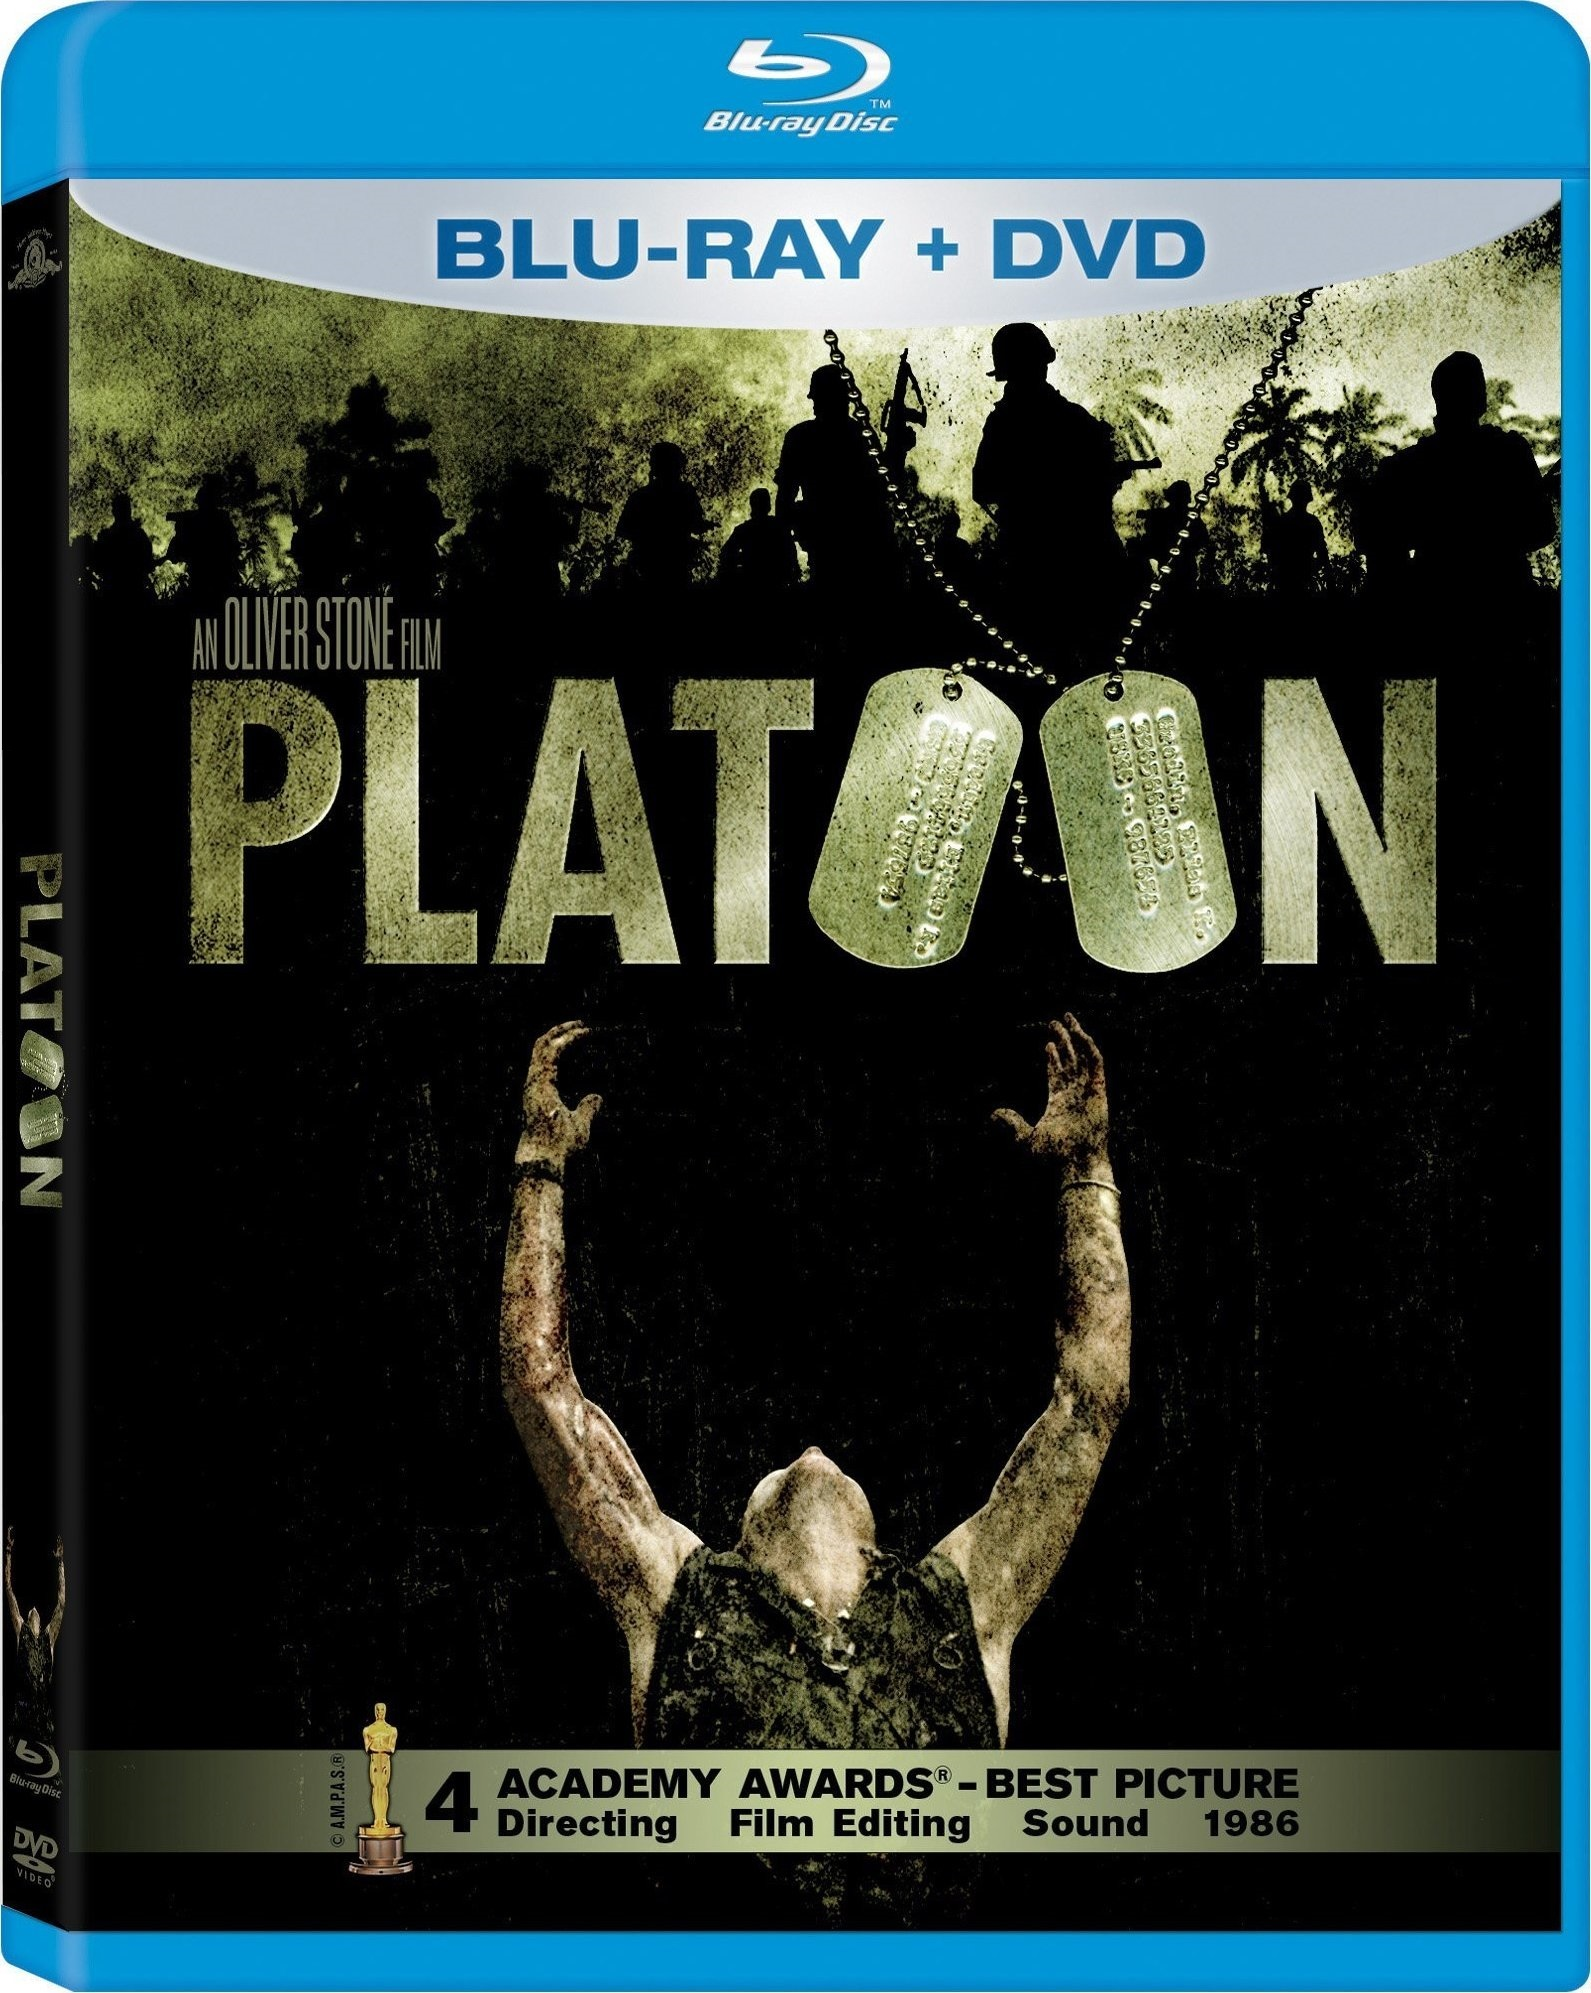 Platoon poster image